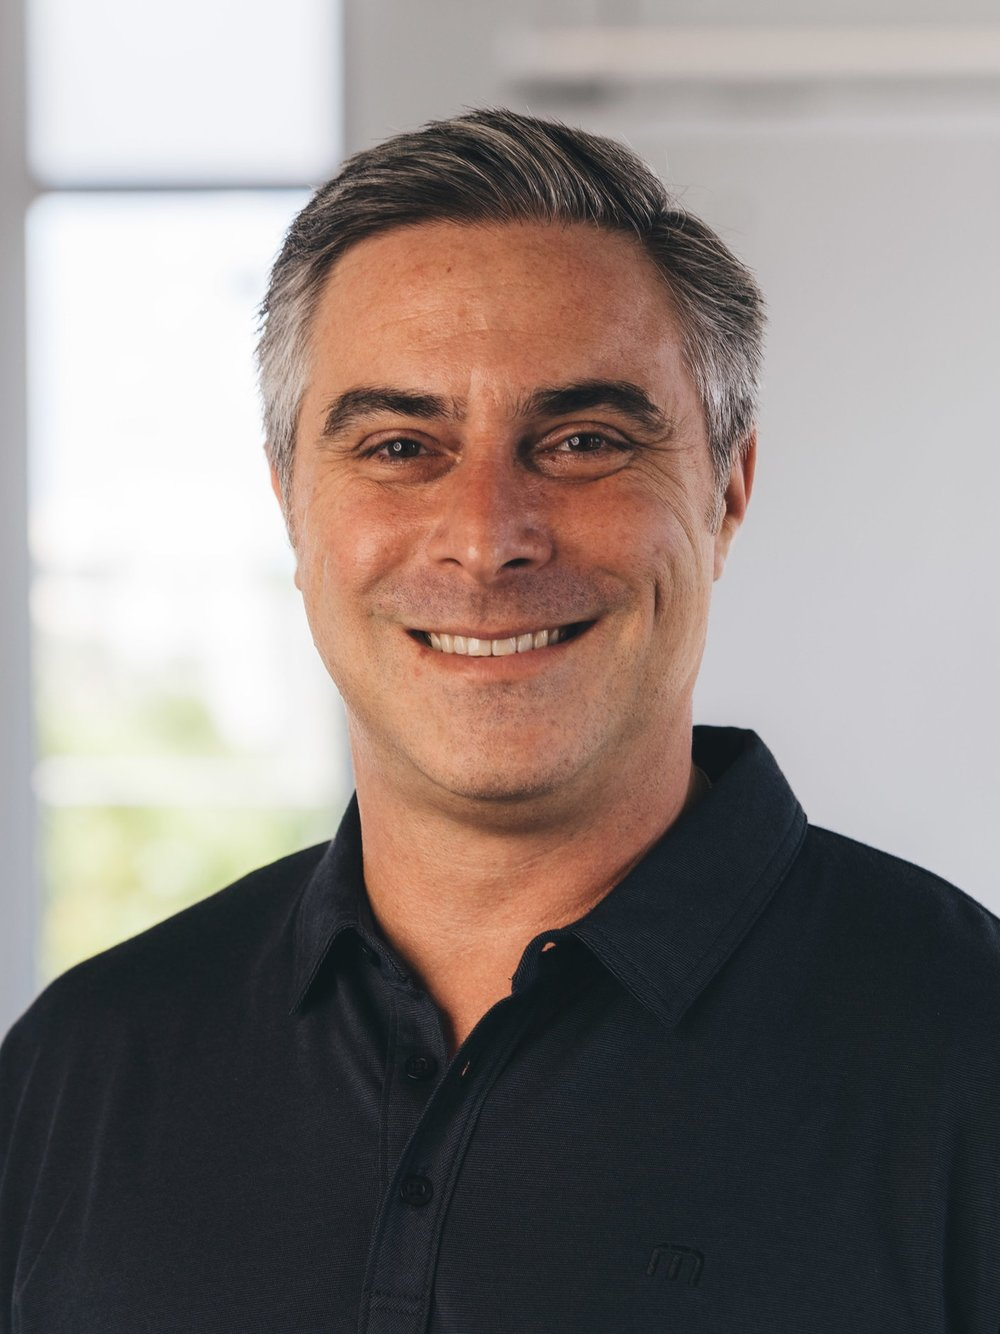 Ron Yacoub